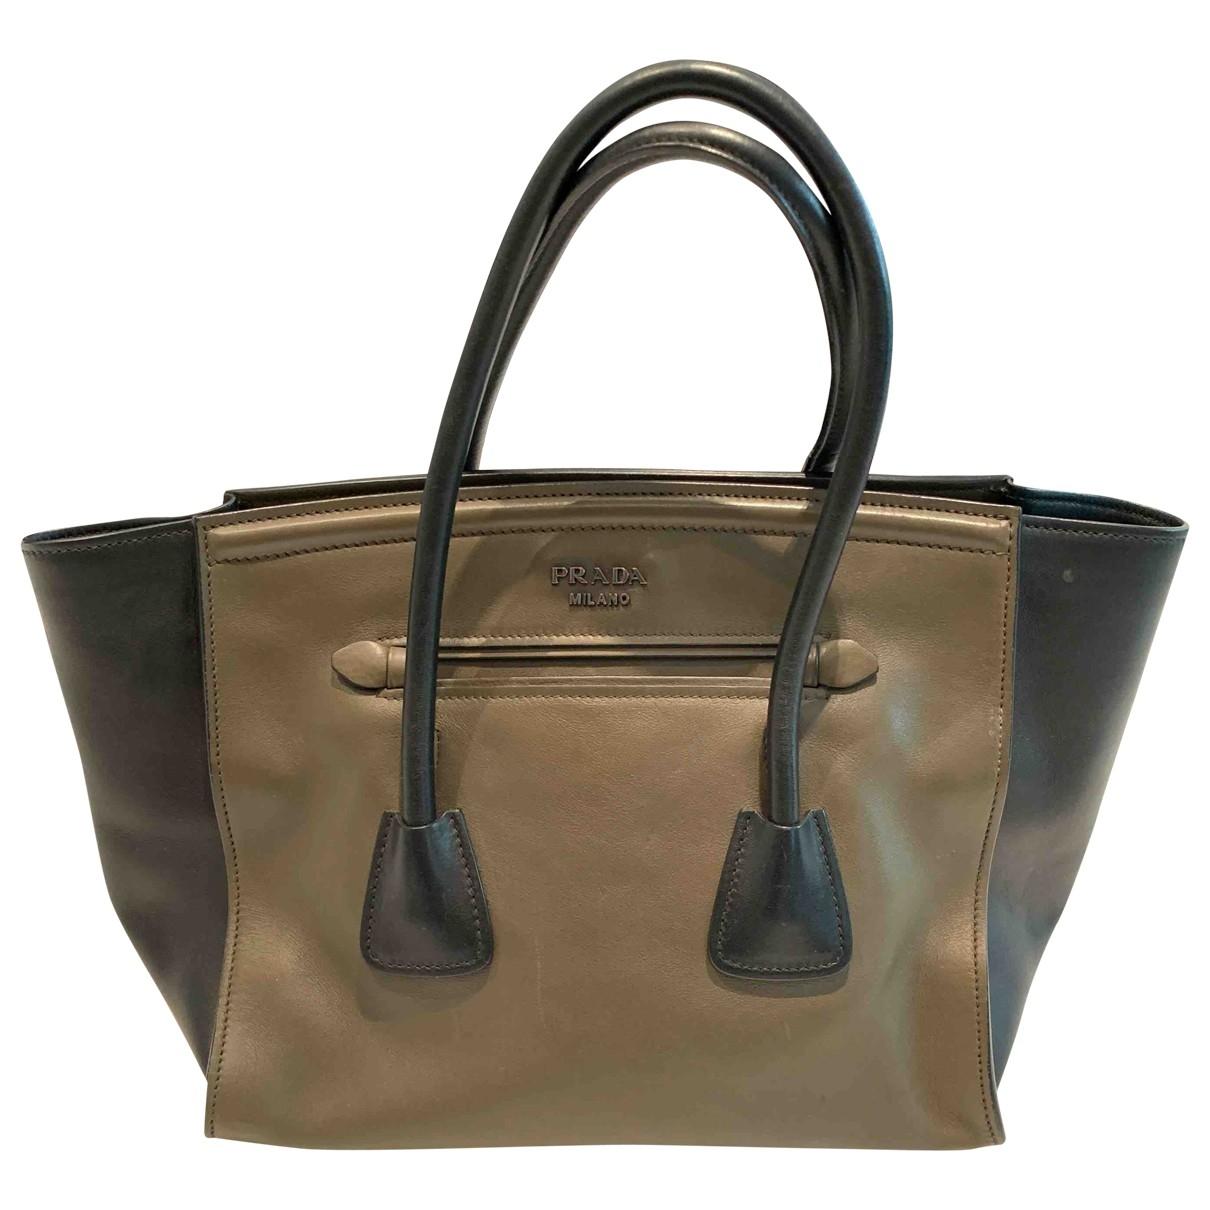 Prada \N Handtasche in  Khaki Lackleder